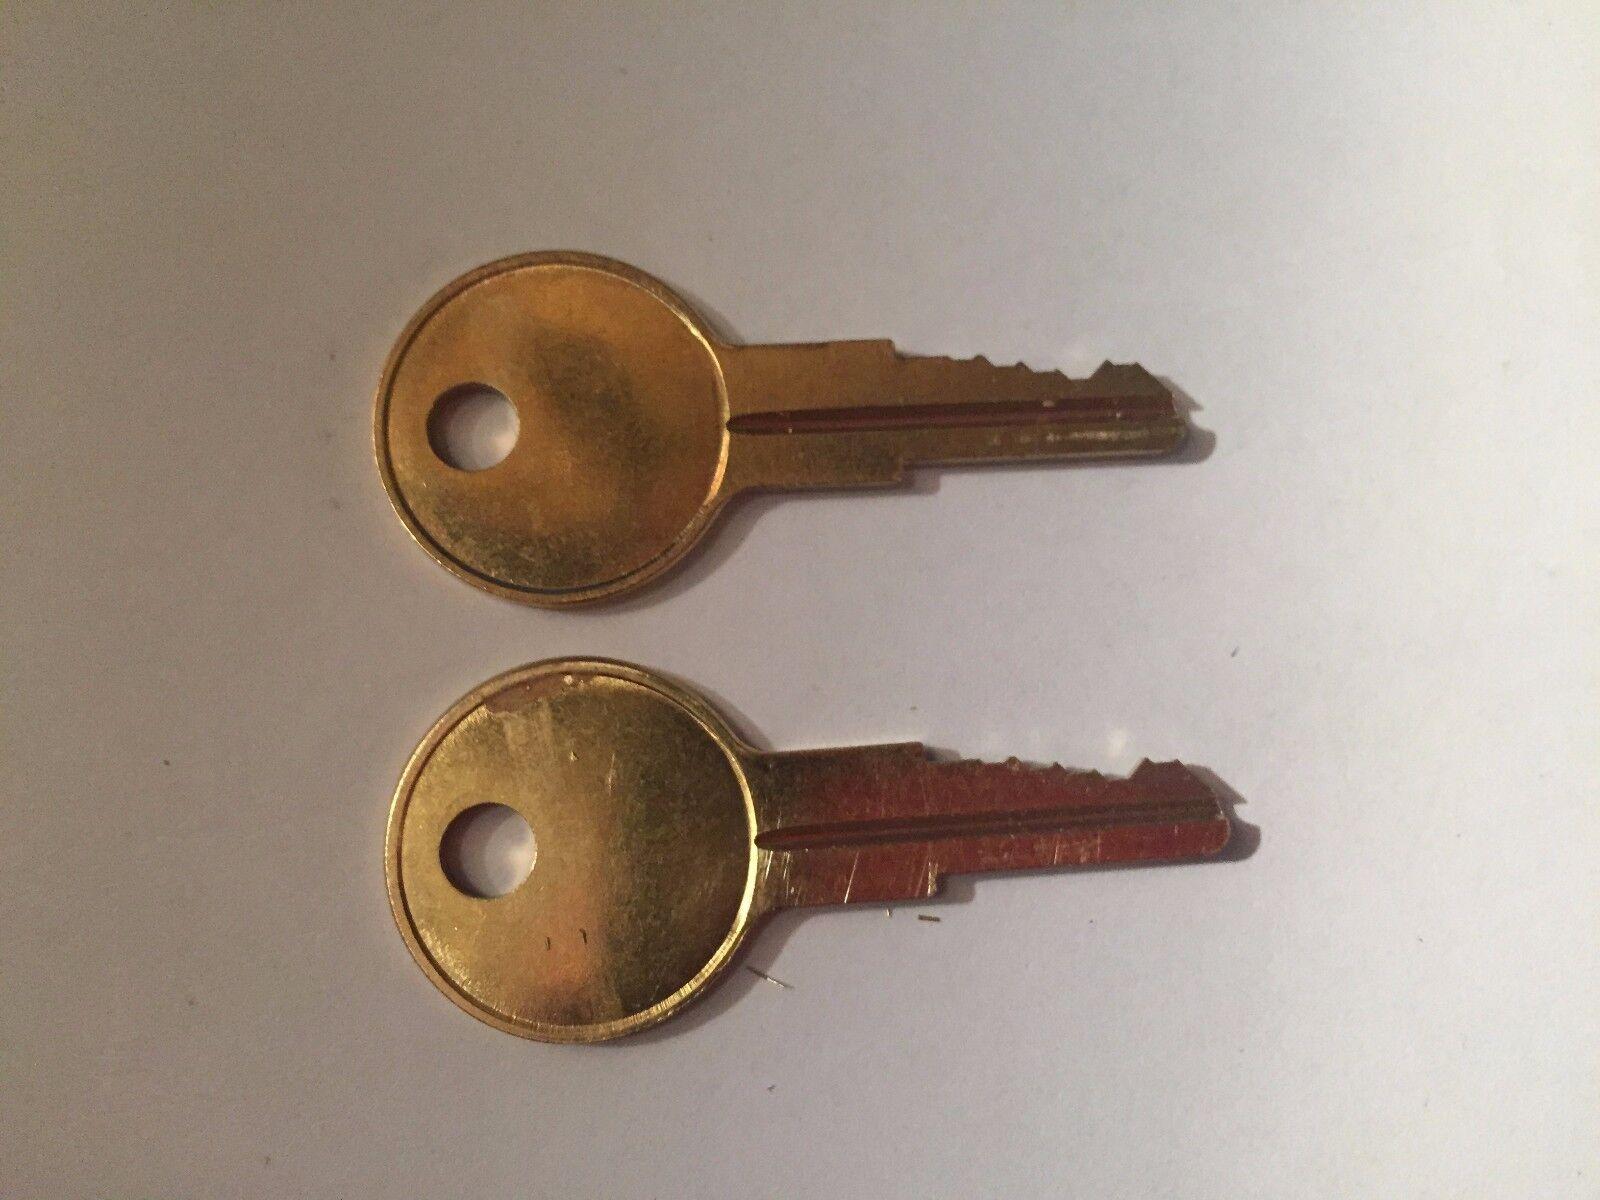 2 Husky Toolbox Keys Codes R611-R612-R613-R614 or R615 Tool Box Chest Lock Key